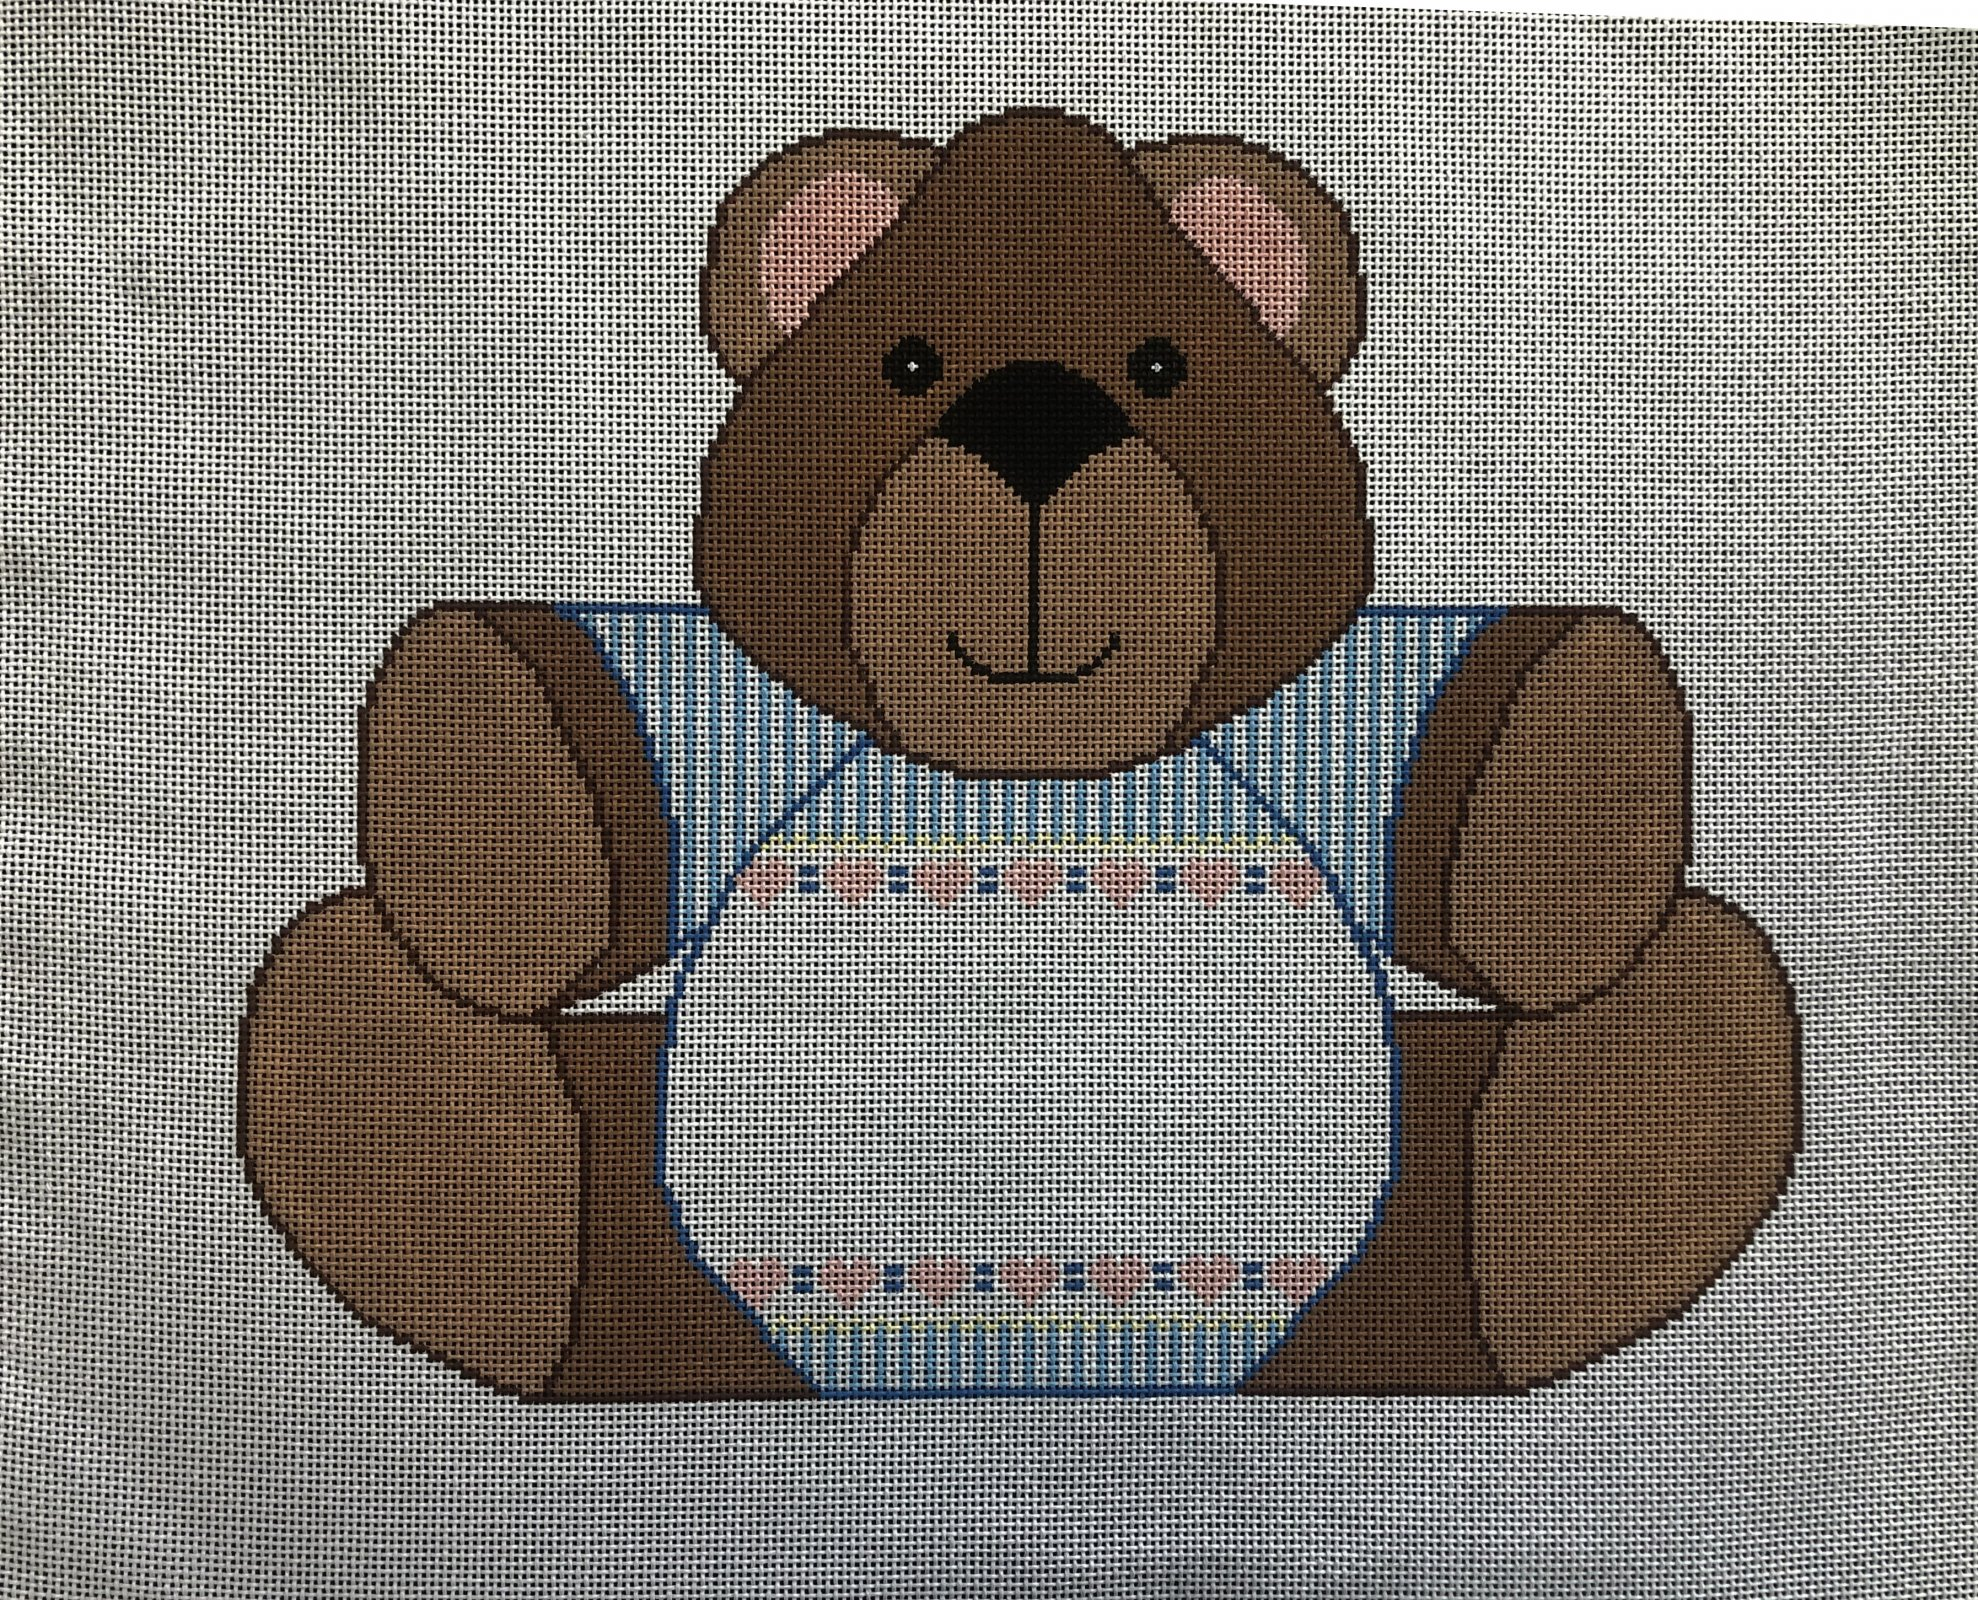 Large Teddy Bear - 13M